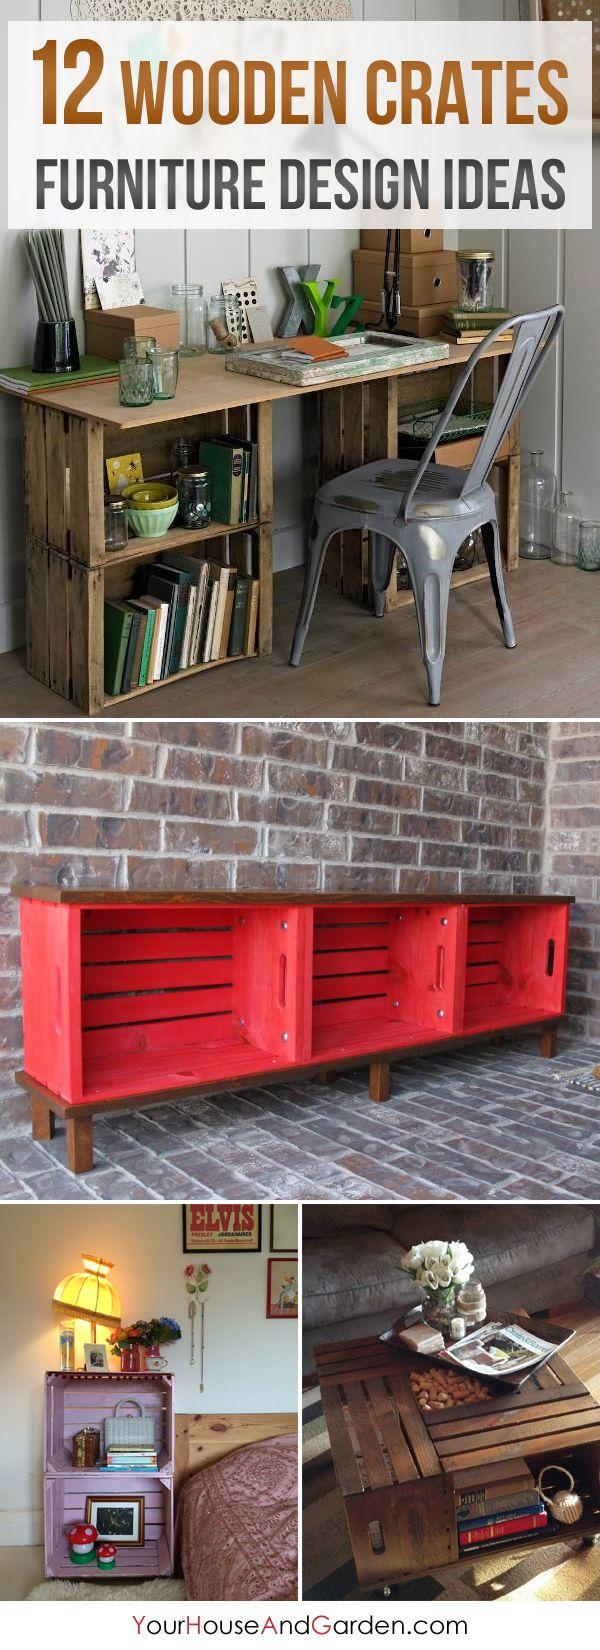 12 Amazing Wooden Crates Furniture Design Ideas Wooden Crate